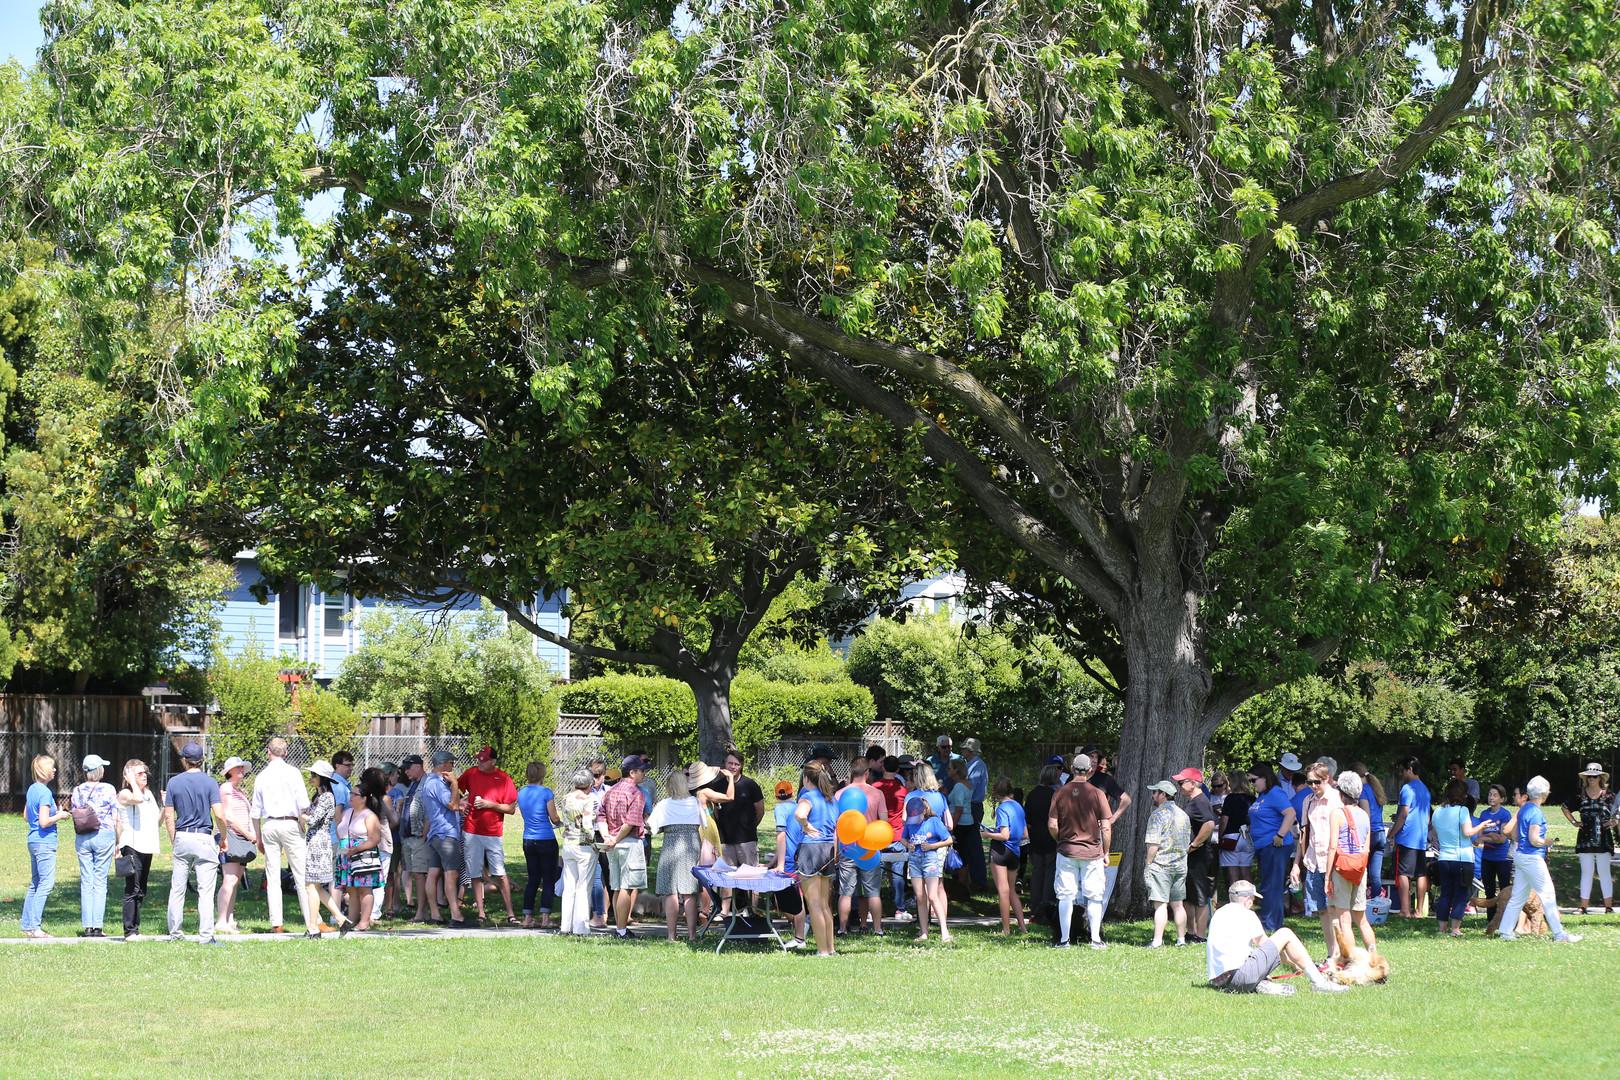 Campaign Kick Off for Alison Cormack for Palo Alto City Council